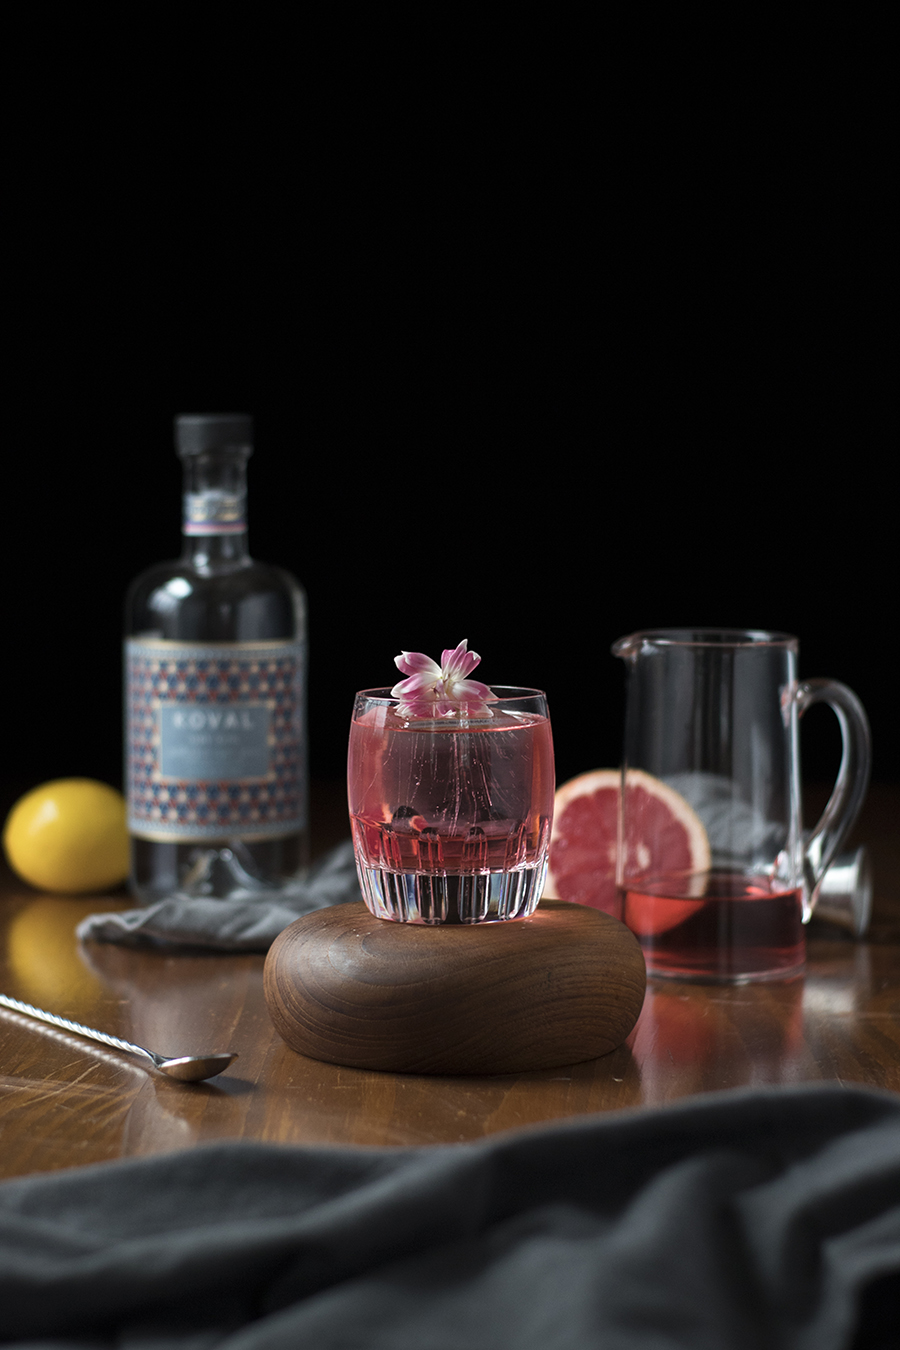 milk clarified cocktail with gin, hibiscus, caramelized bananas, grapefruit, lemon